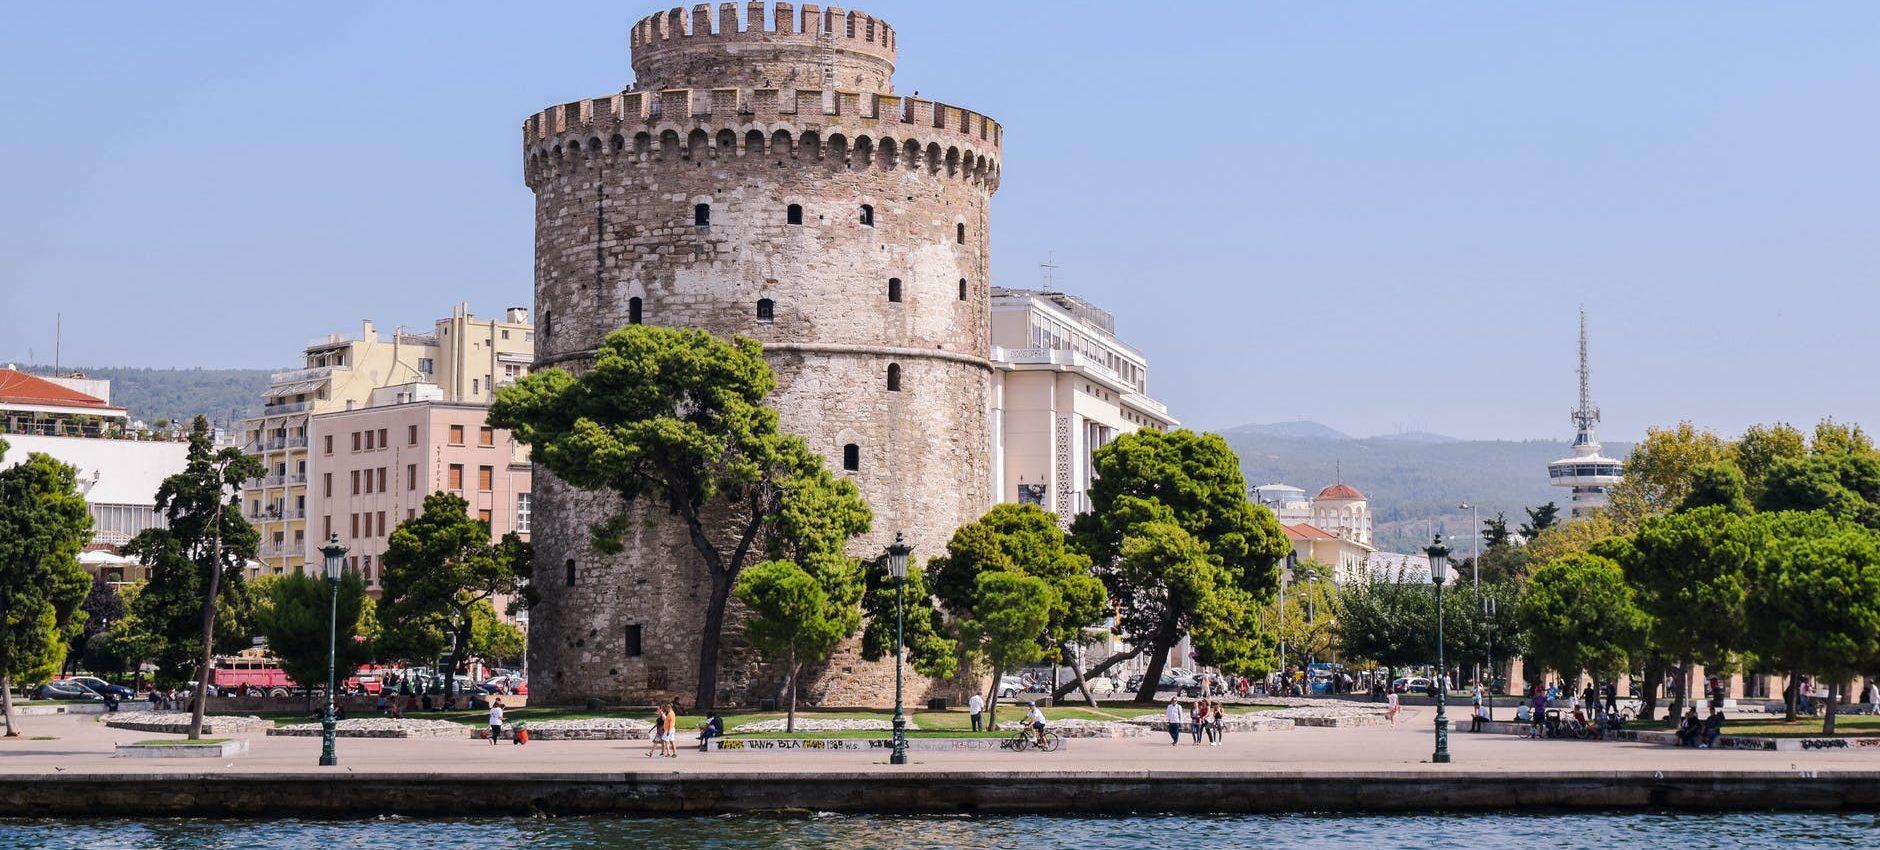 Trans-Atlantic Training 2021 (Thessaloniki, Greece)